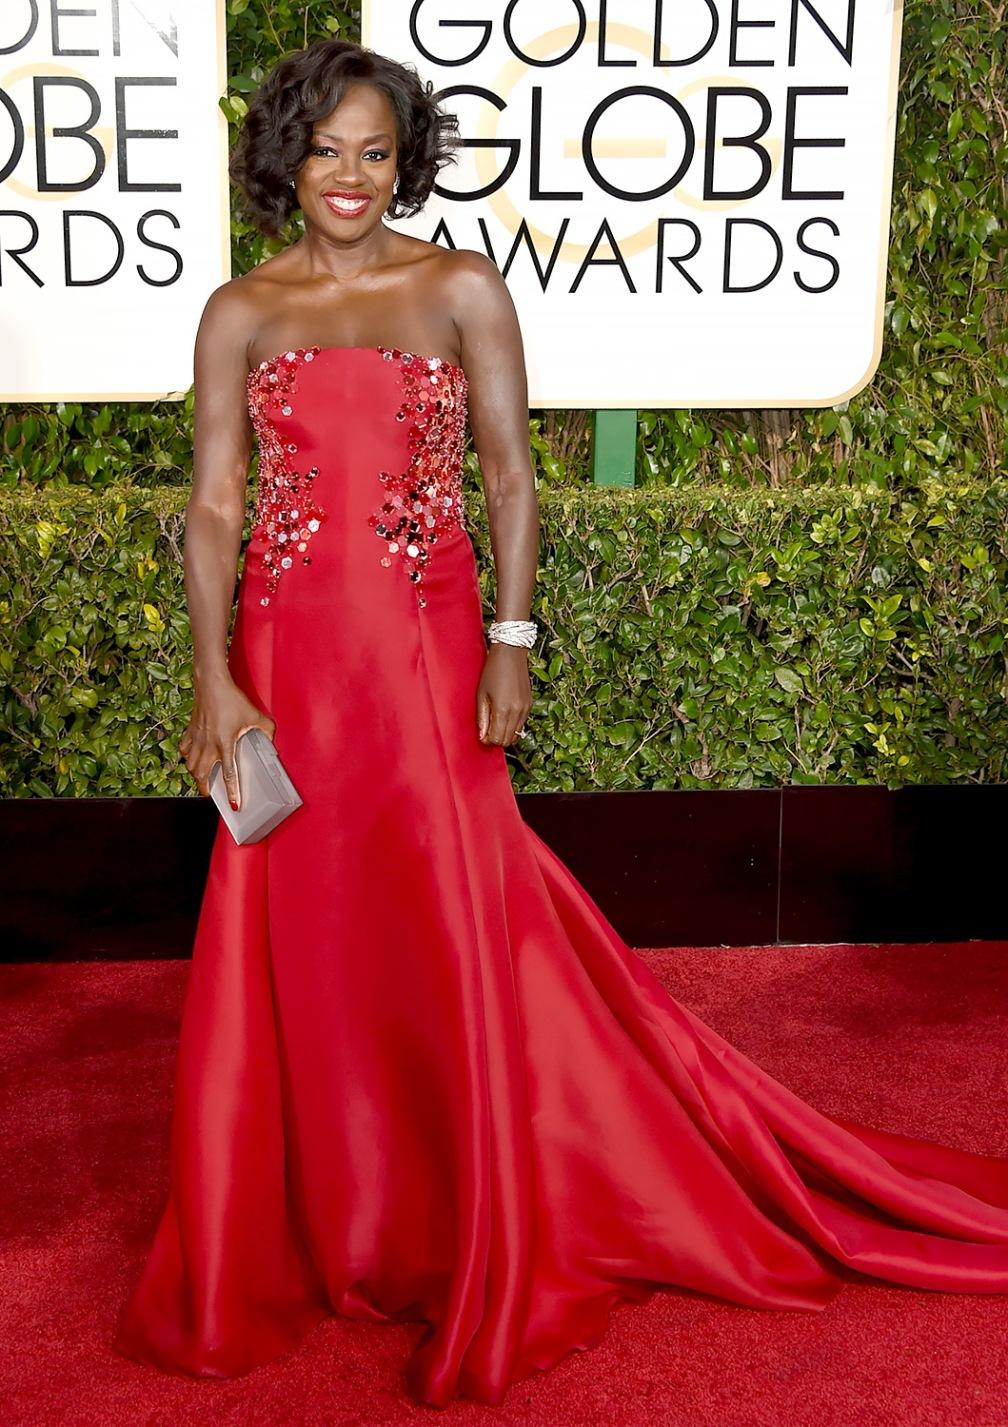 Viola Davis - I mean Viola can wear a comforter and  still look HOT!